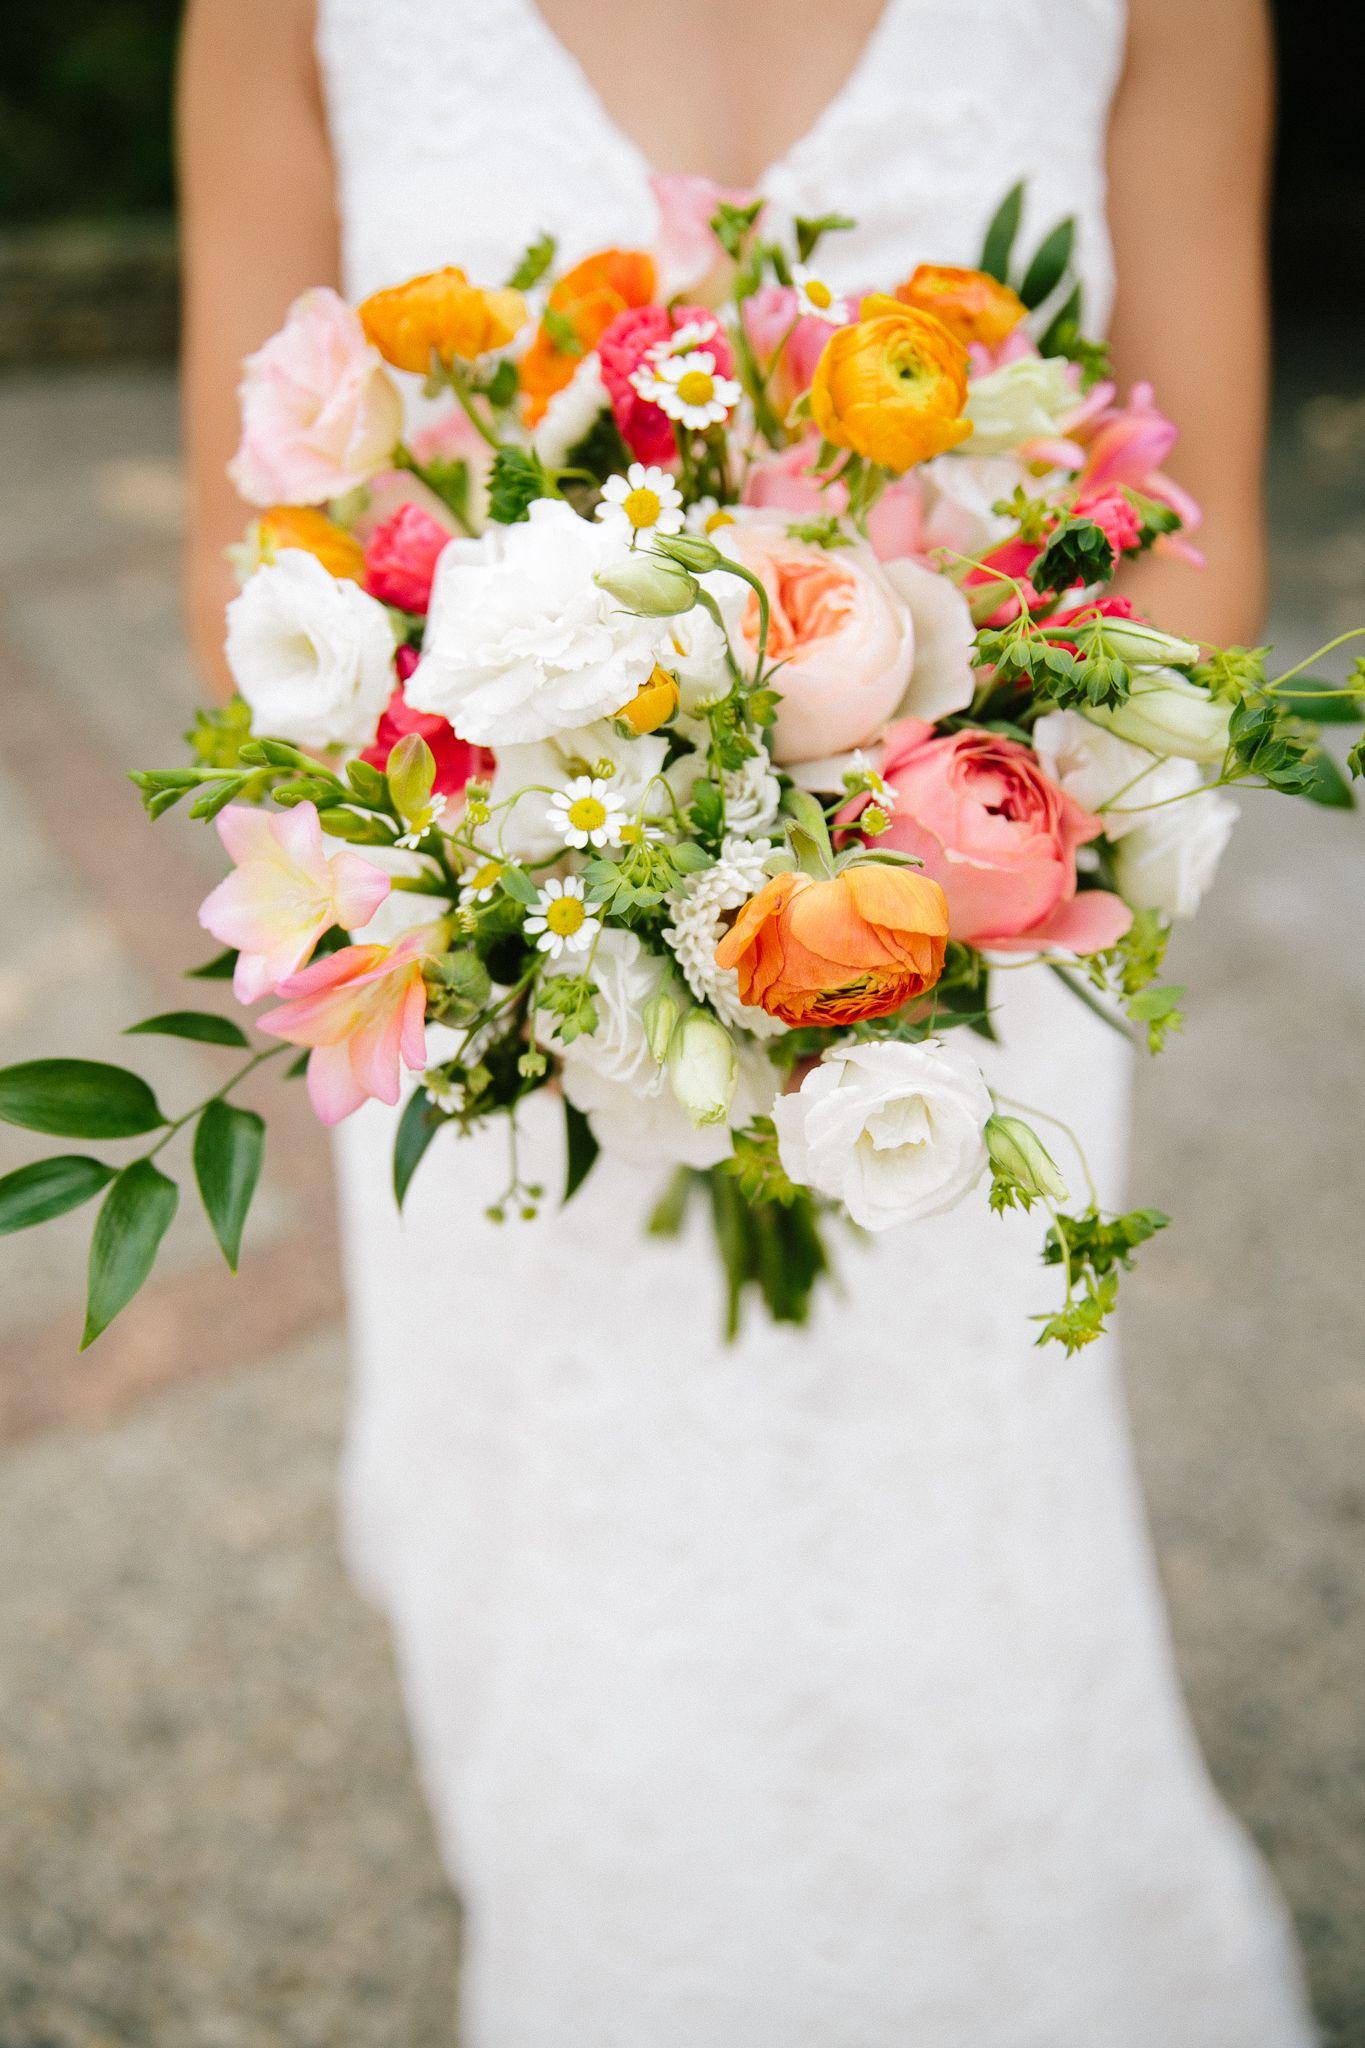 Katie carried orange ranunculus white carnations pink